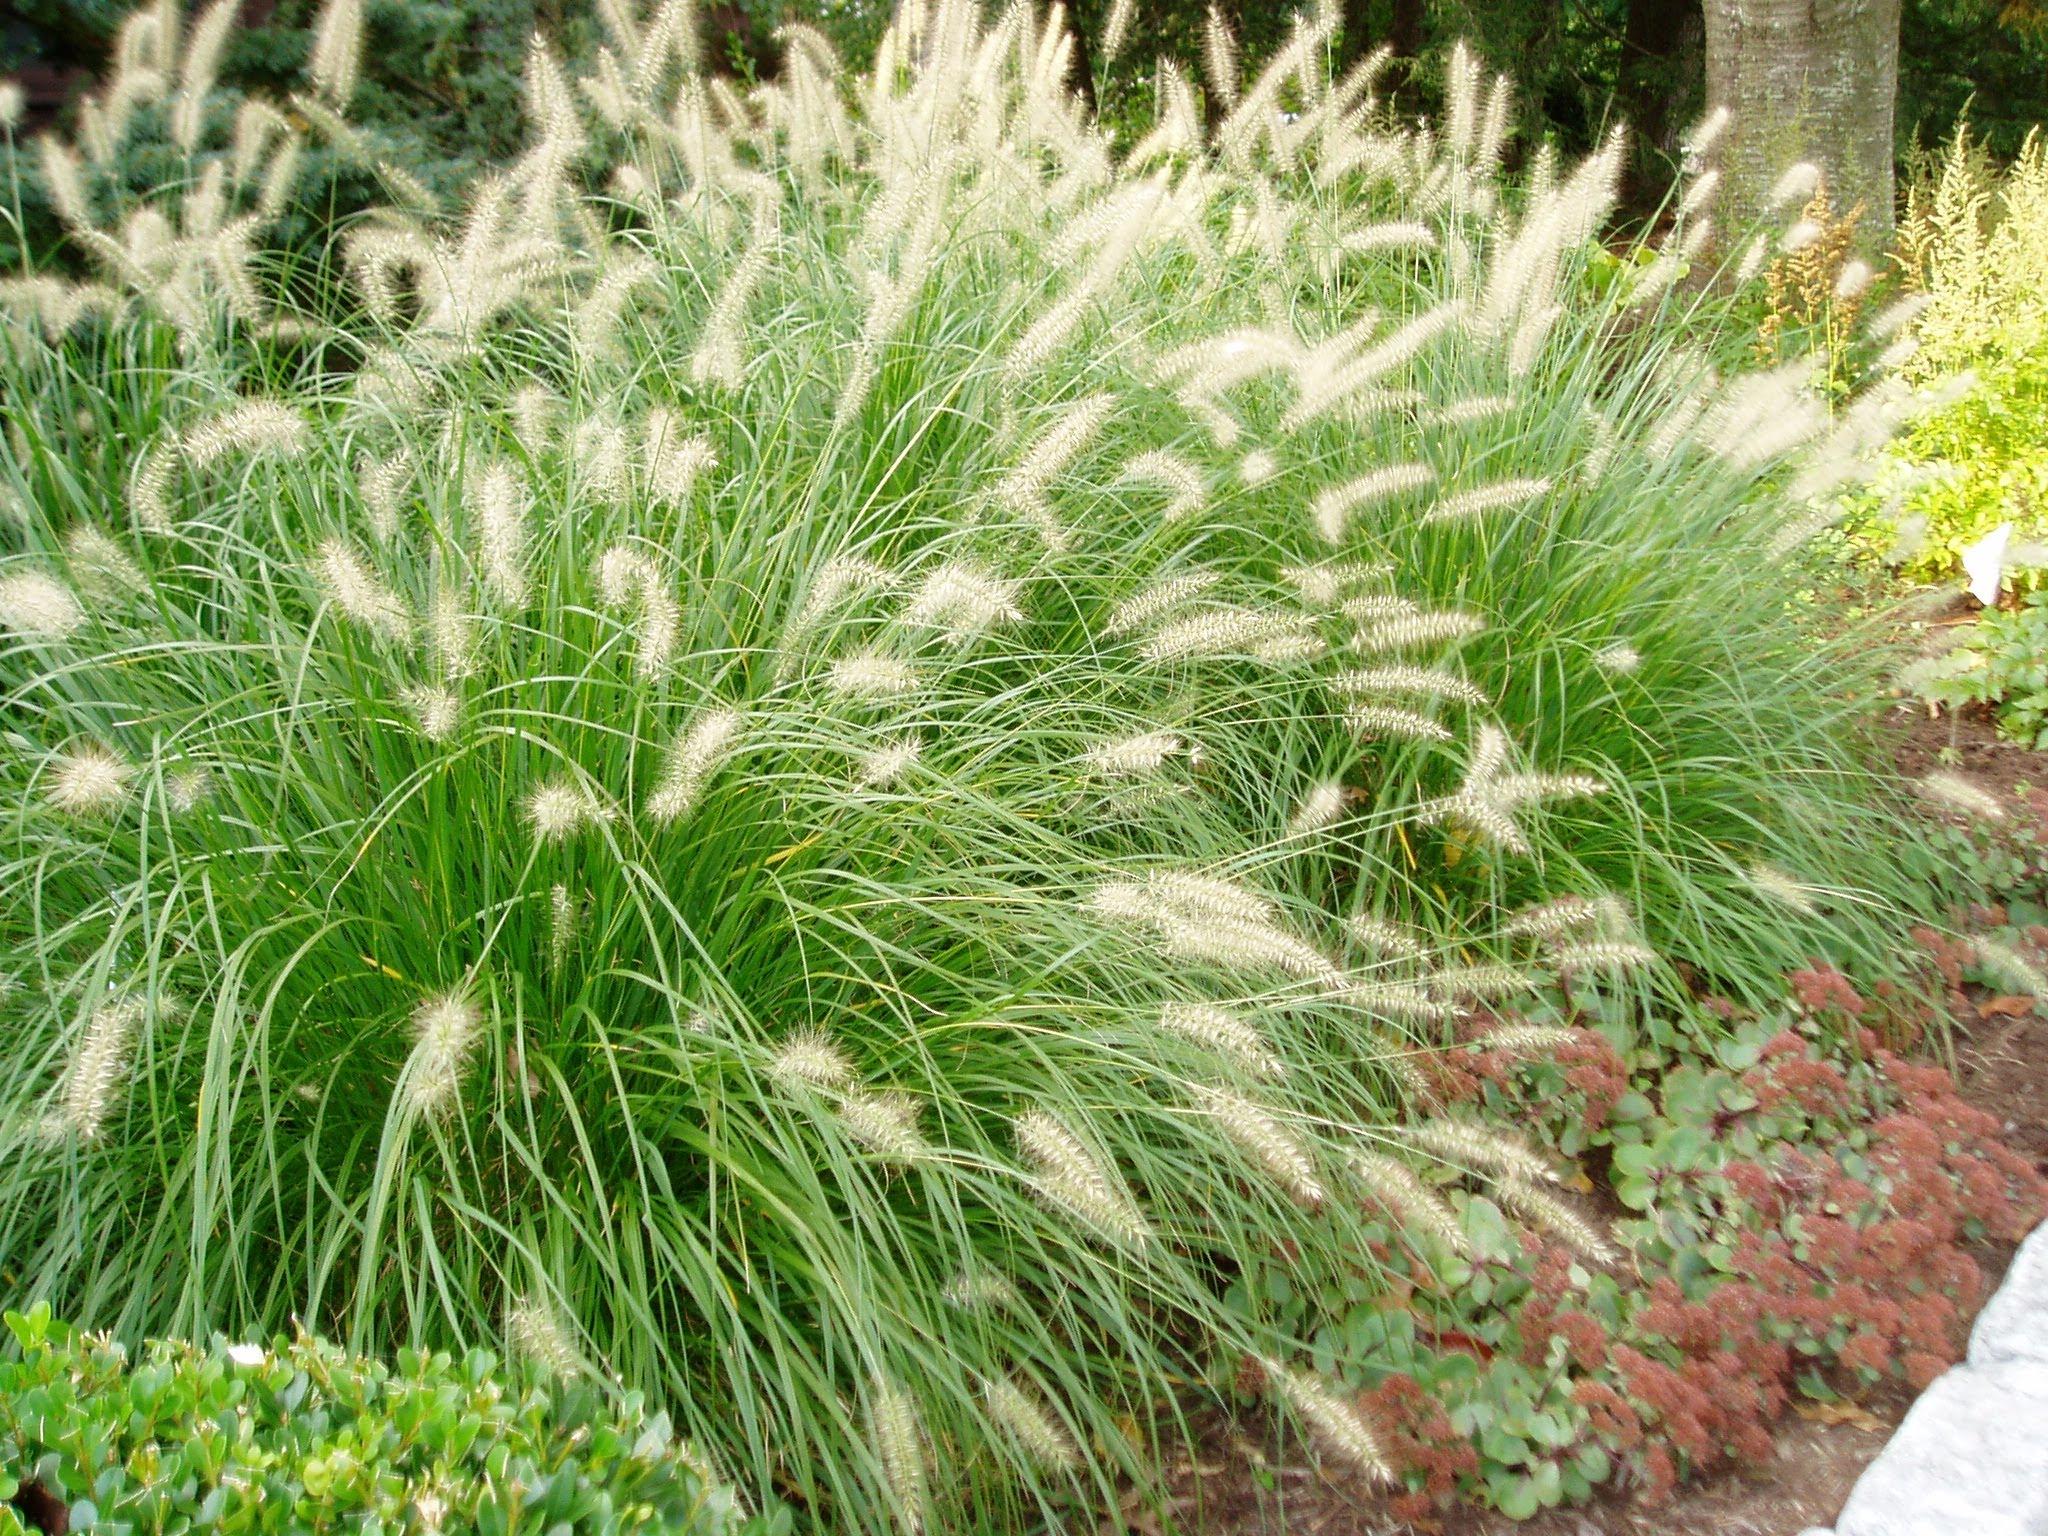 Ornamental Grass Garden Plan Perennials raleigh nc ground cover ornamental grasses workwithnaturefo